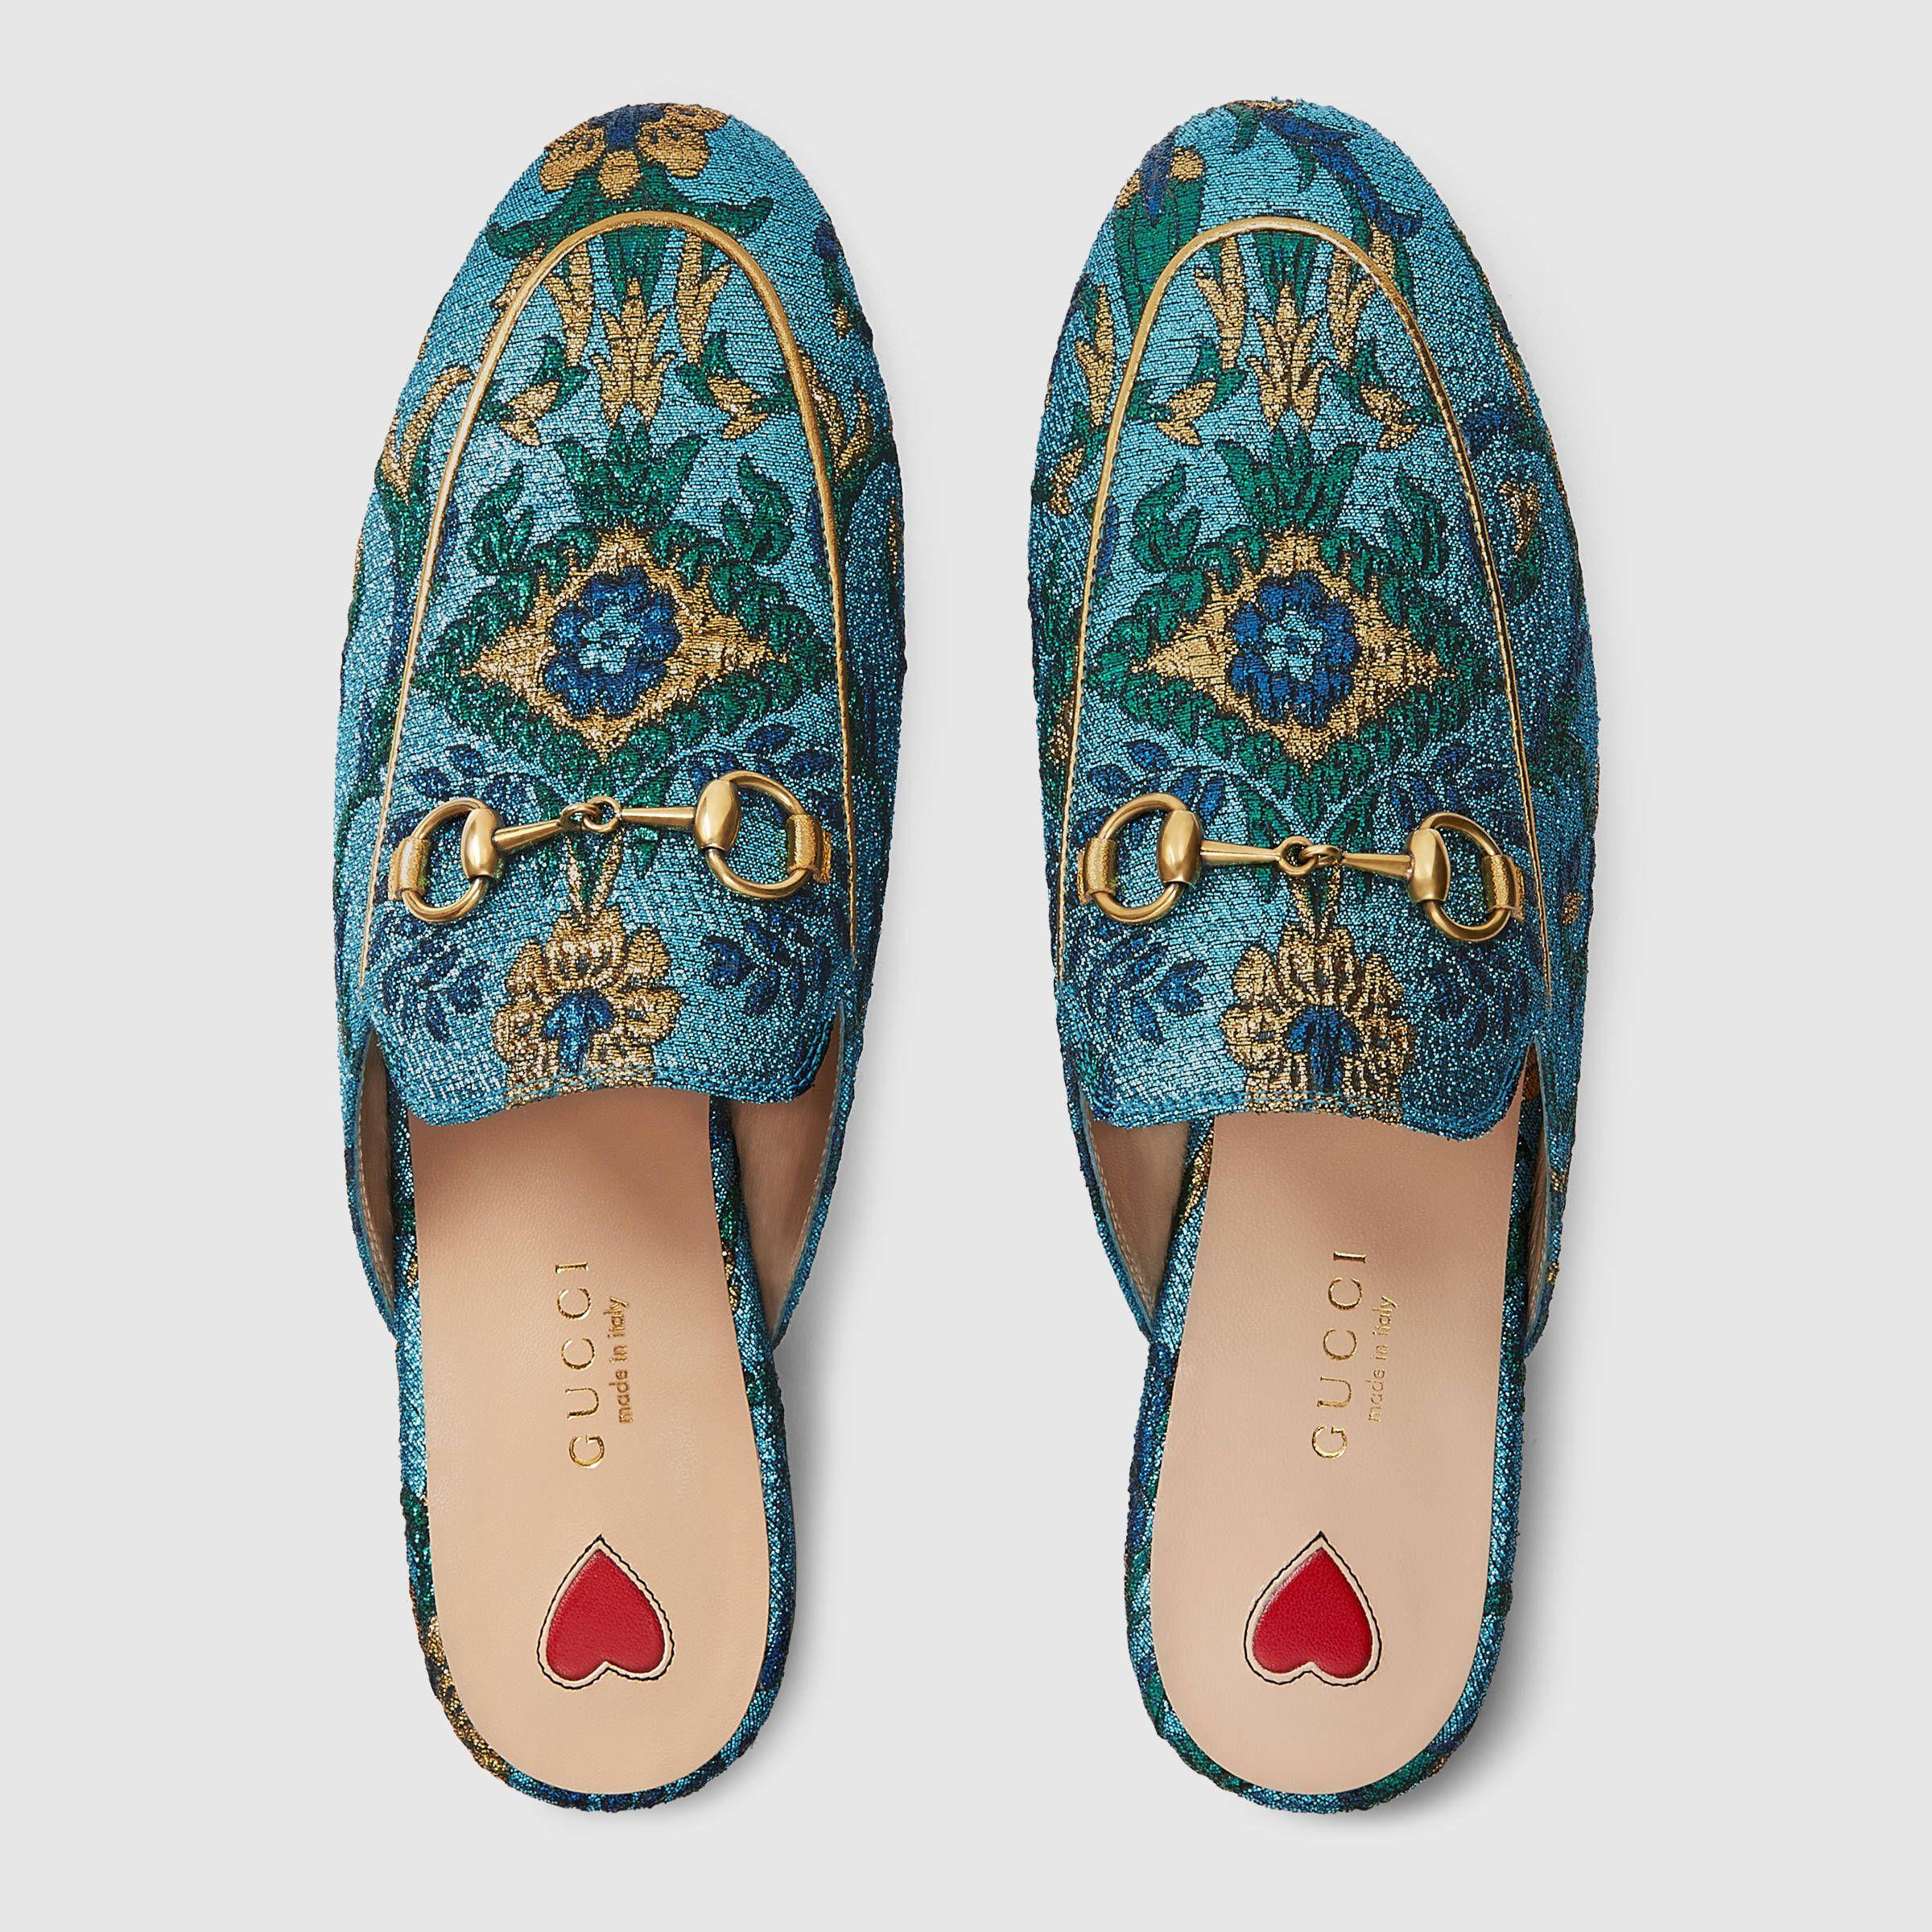 bdcbaf5d5b1 Princetown brocade slipper - Gucci Women s Moccasins   Loafers  472640K9O204967